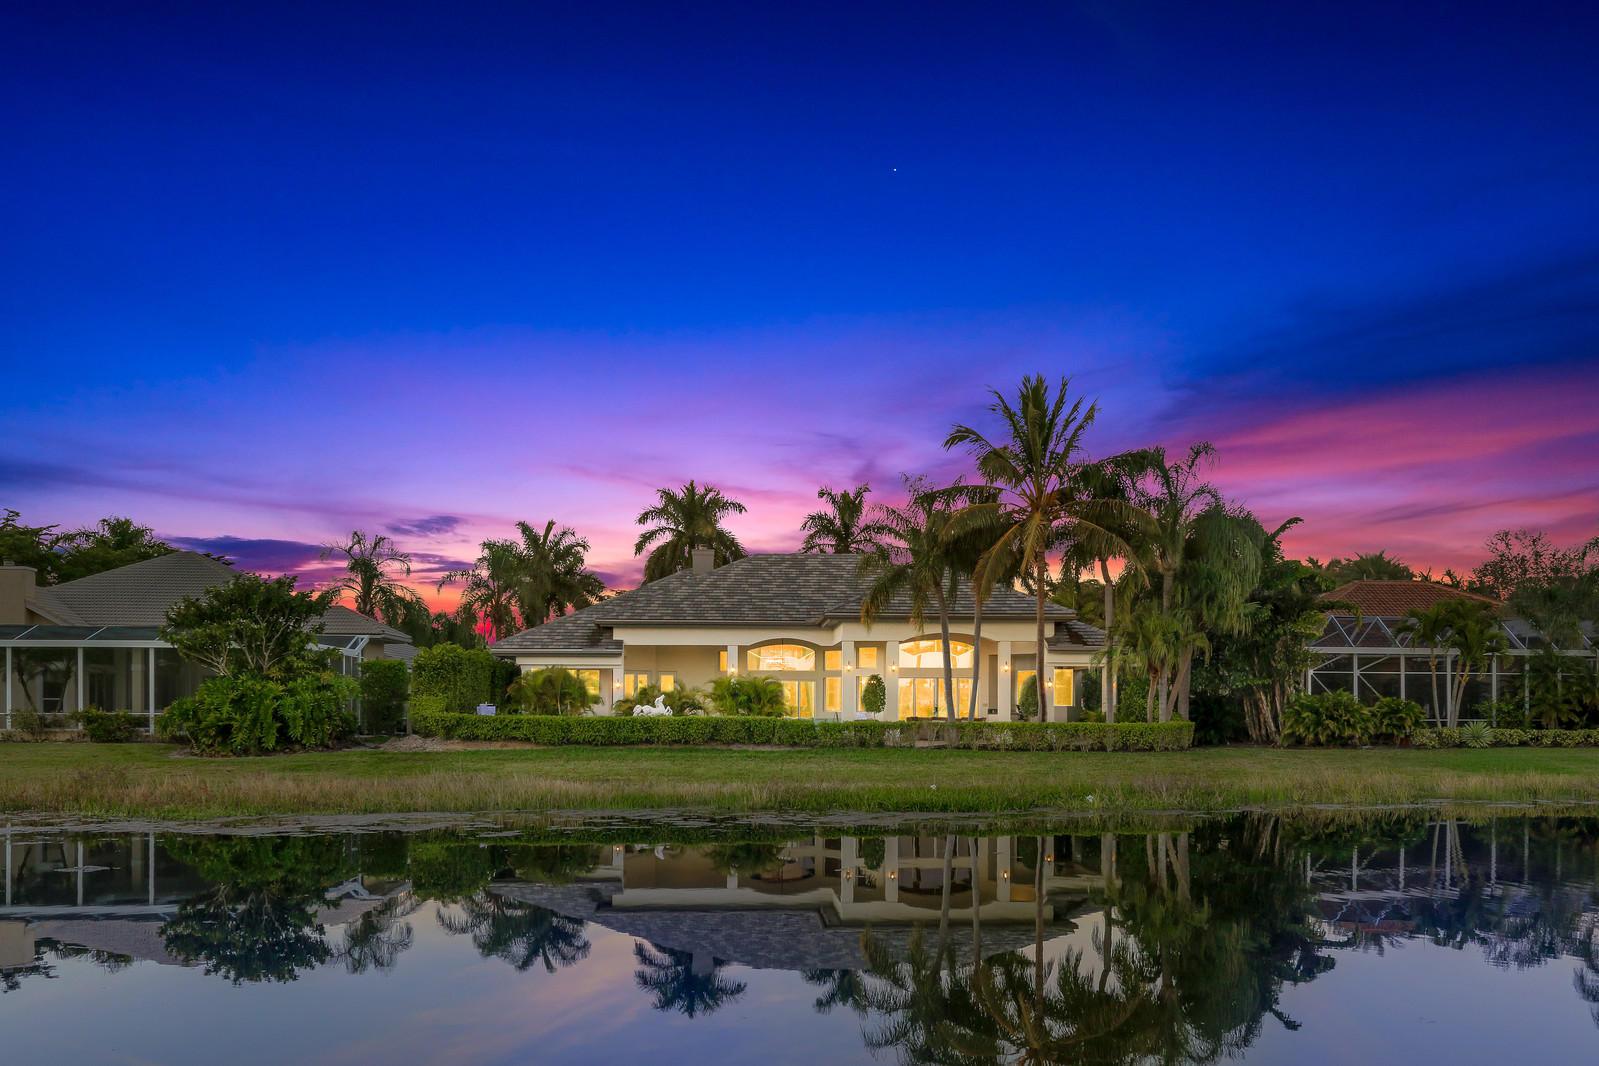 10892 Egret Pointe Lane, West Palm Beach, Florida 33412, 3 Bedrooms Bedrooms, ,4.1 BathroomsBathrooms,A,Single family,Egret Pointe,RX-10503877